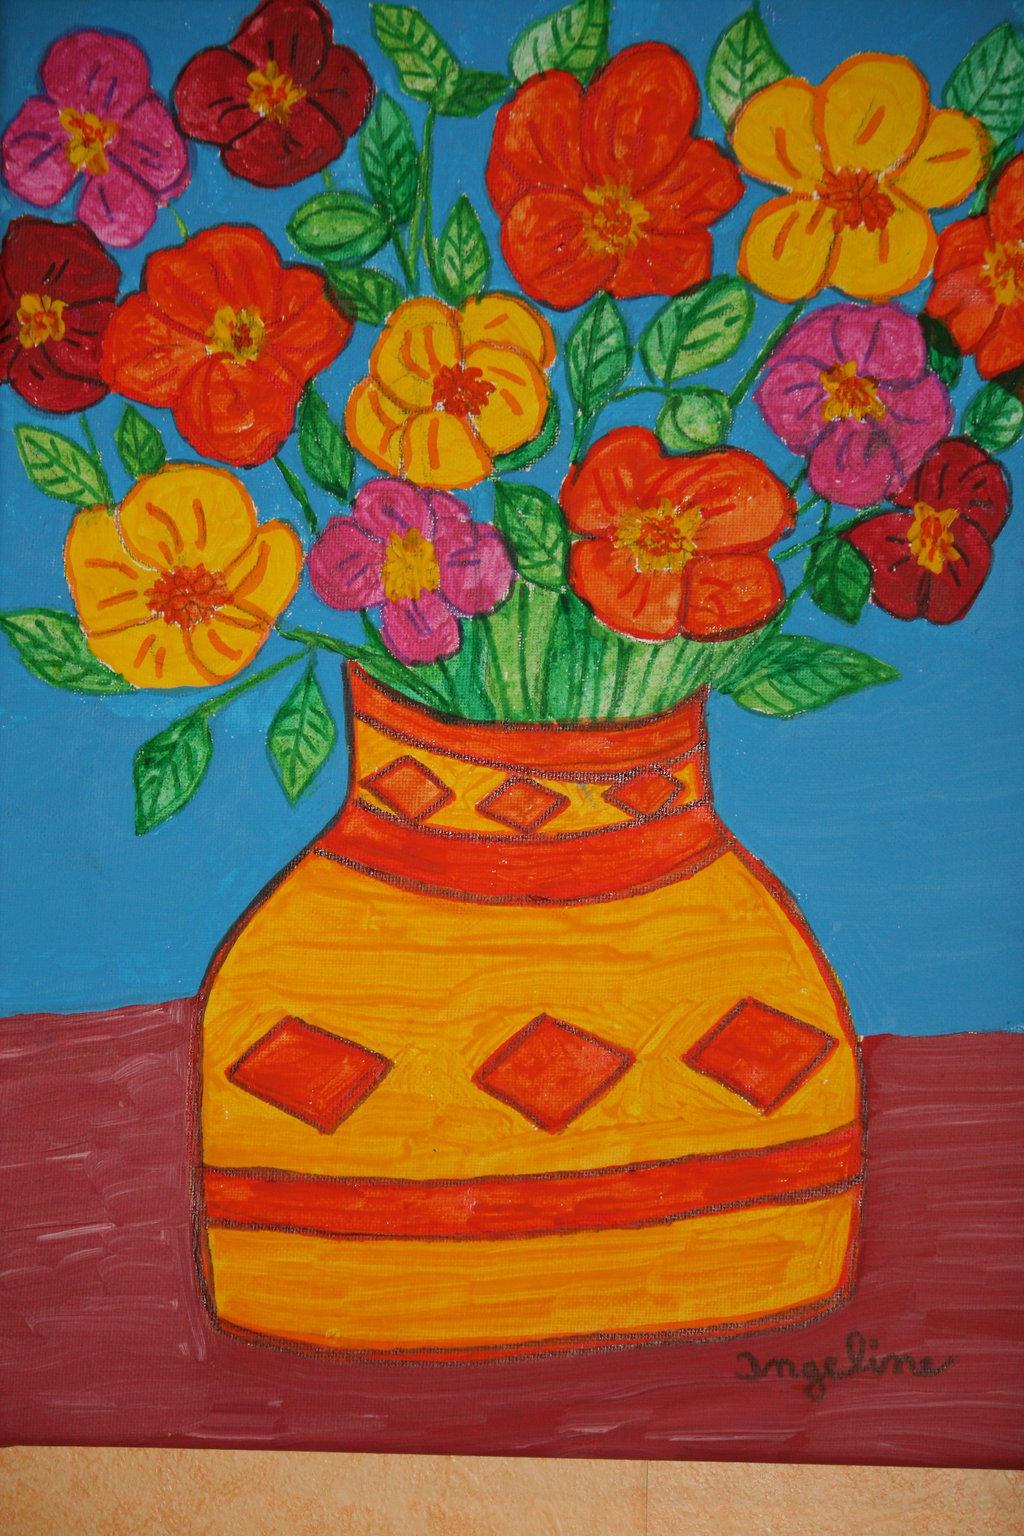 welcome spring flowers by ingeline-art